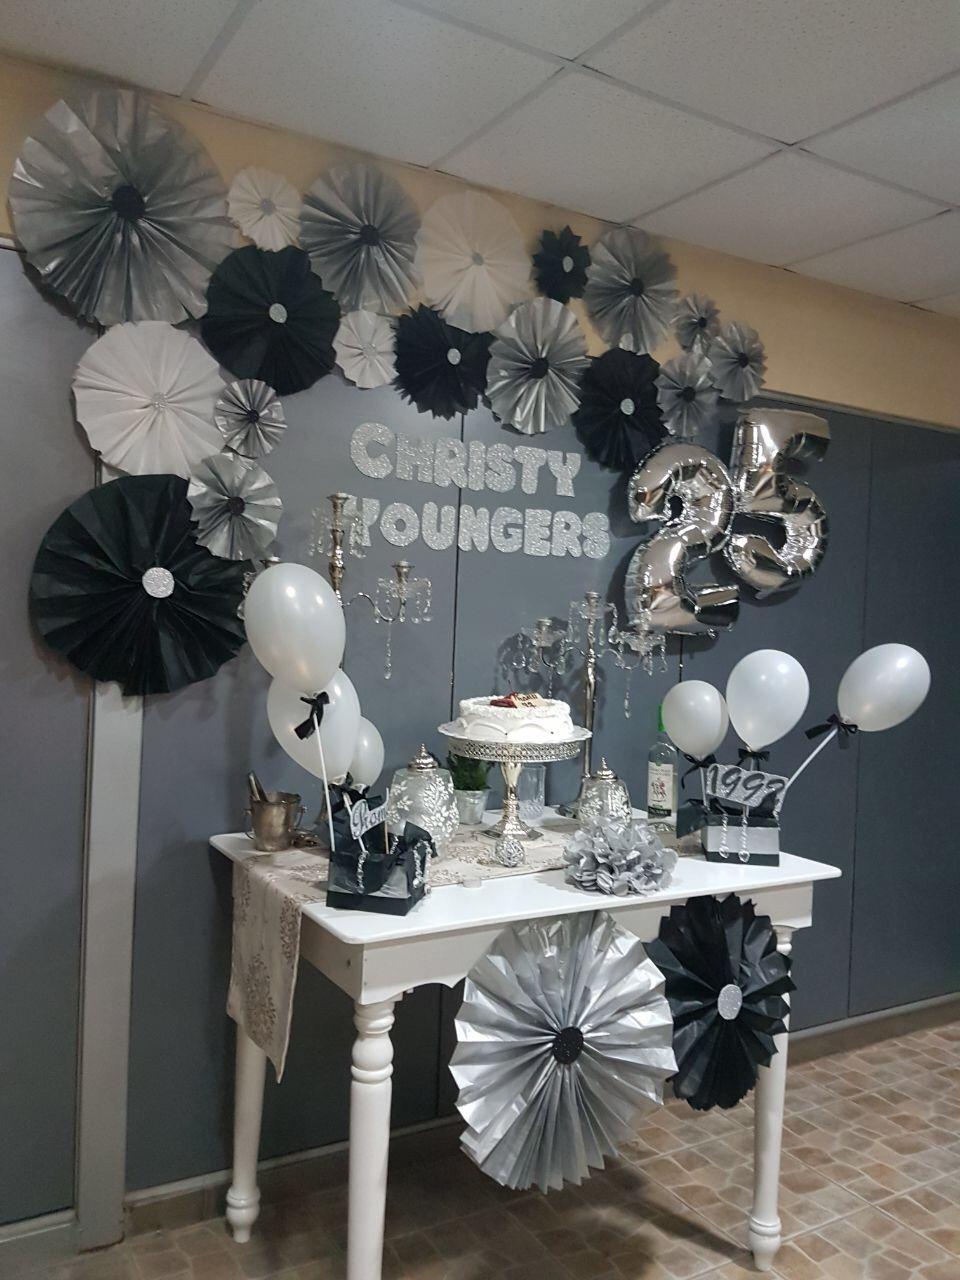 Decoracin bodas de plata de promocin de colegio Deco Pinterest